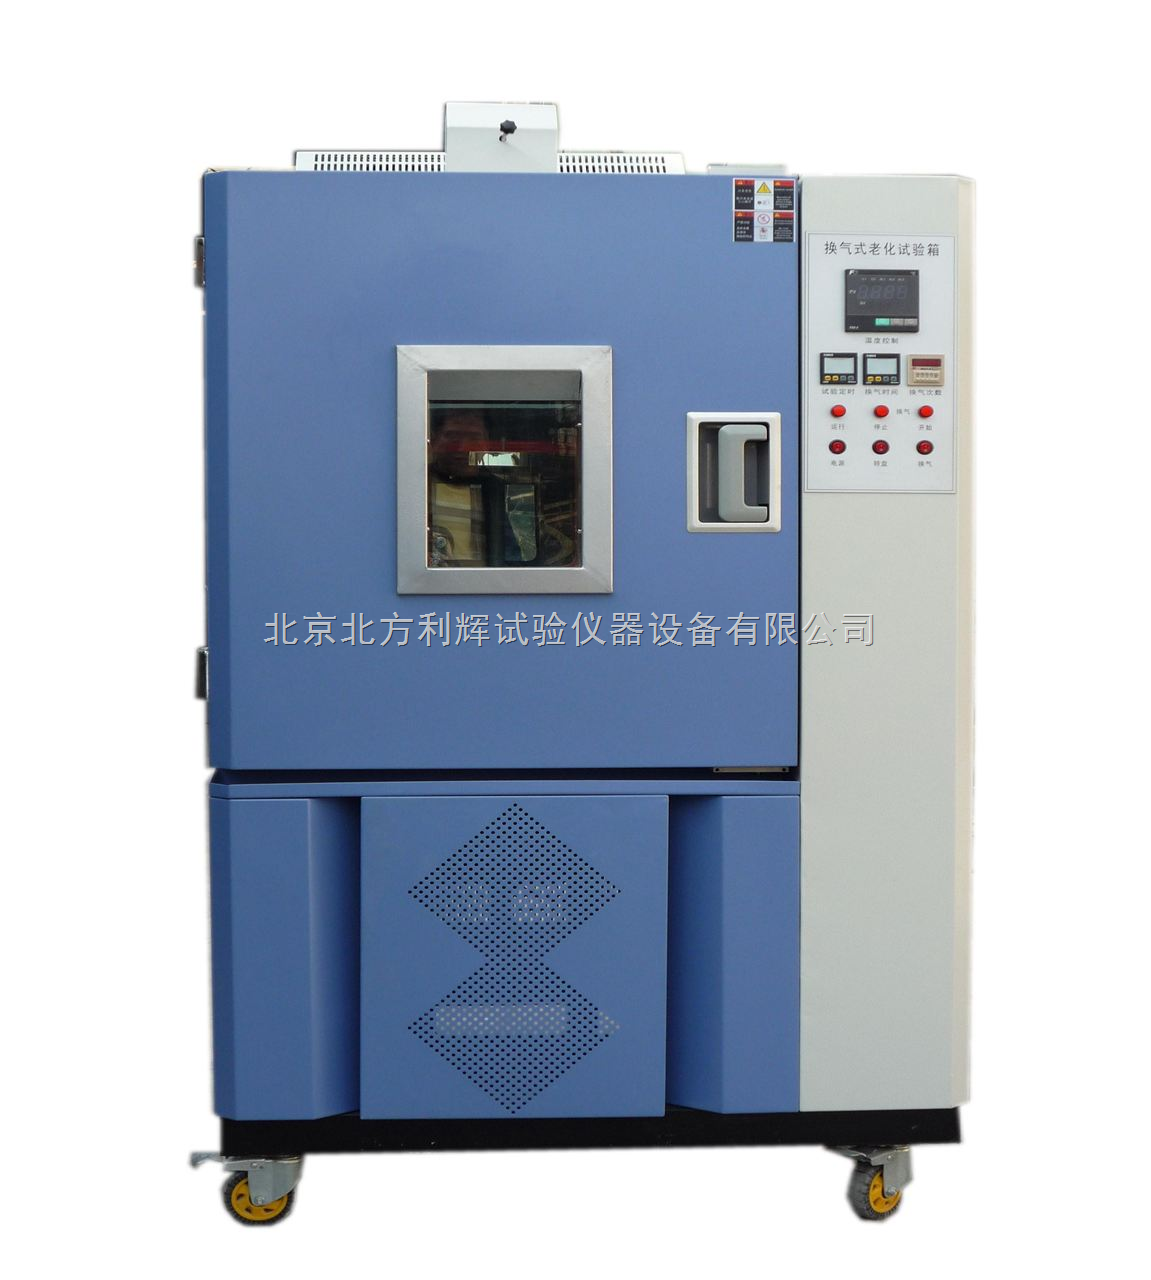 QLH-0*型换气老化试验箱